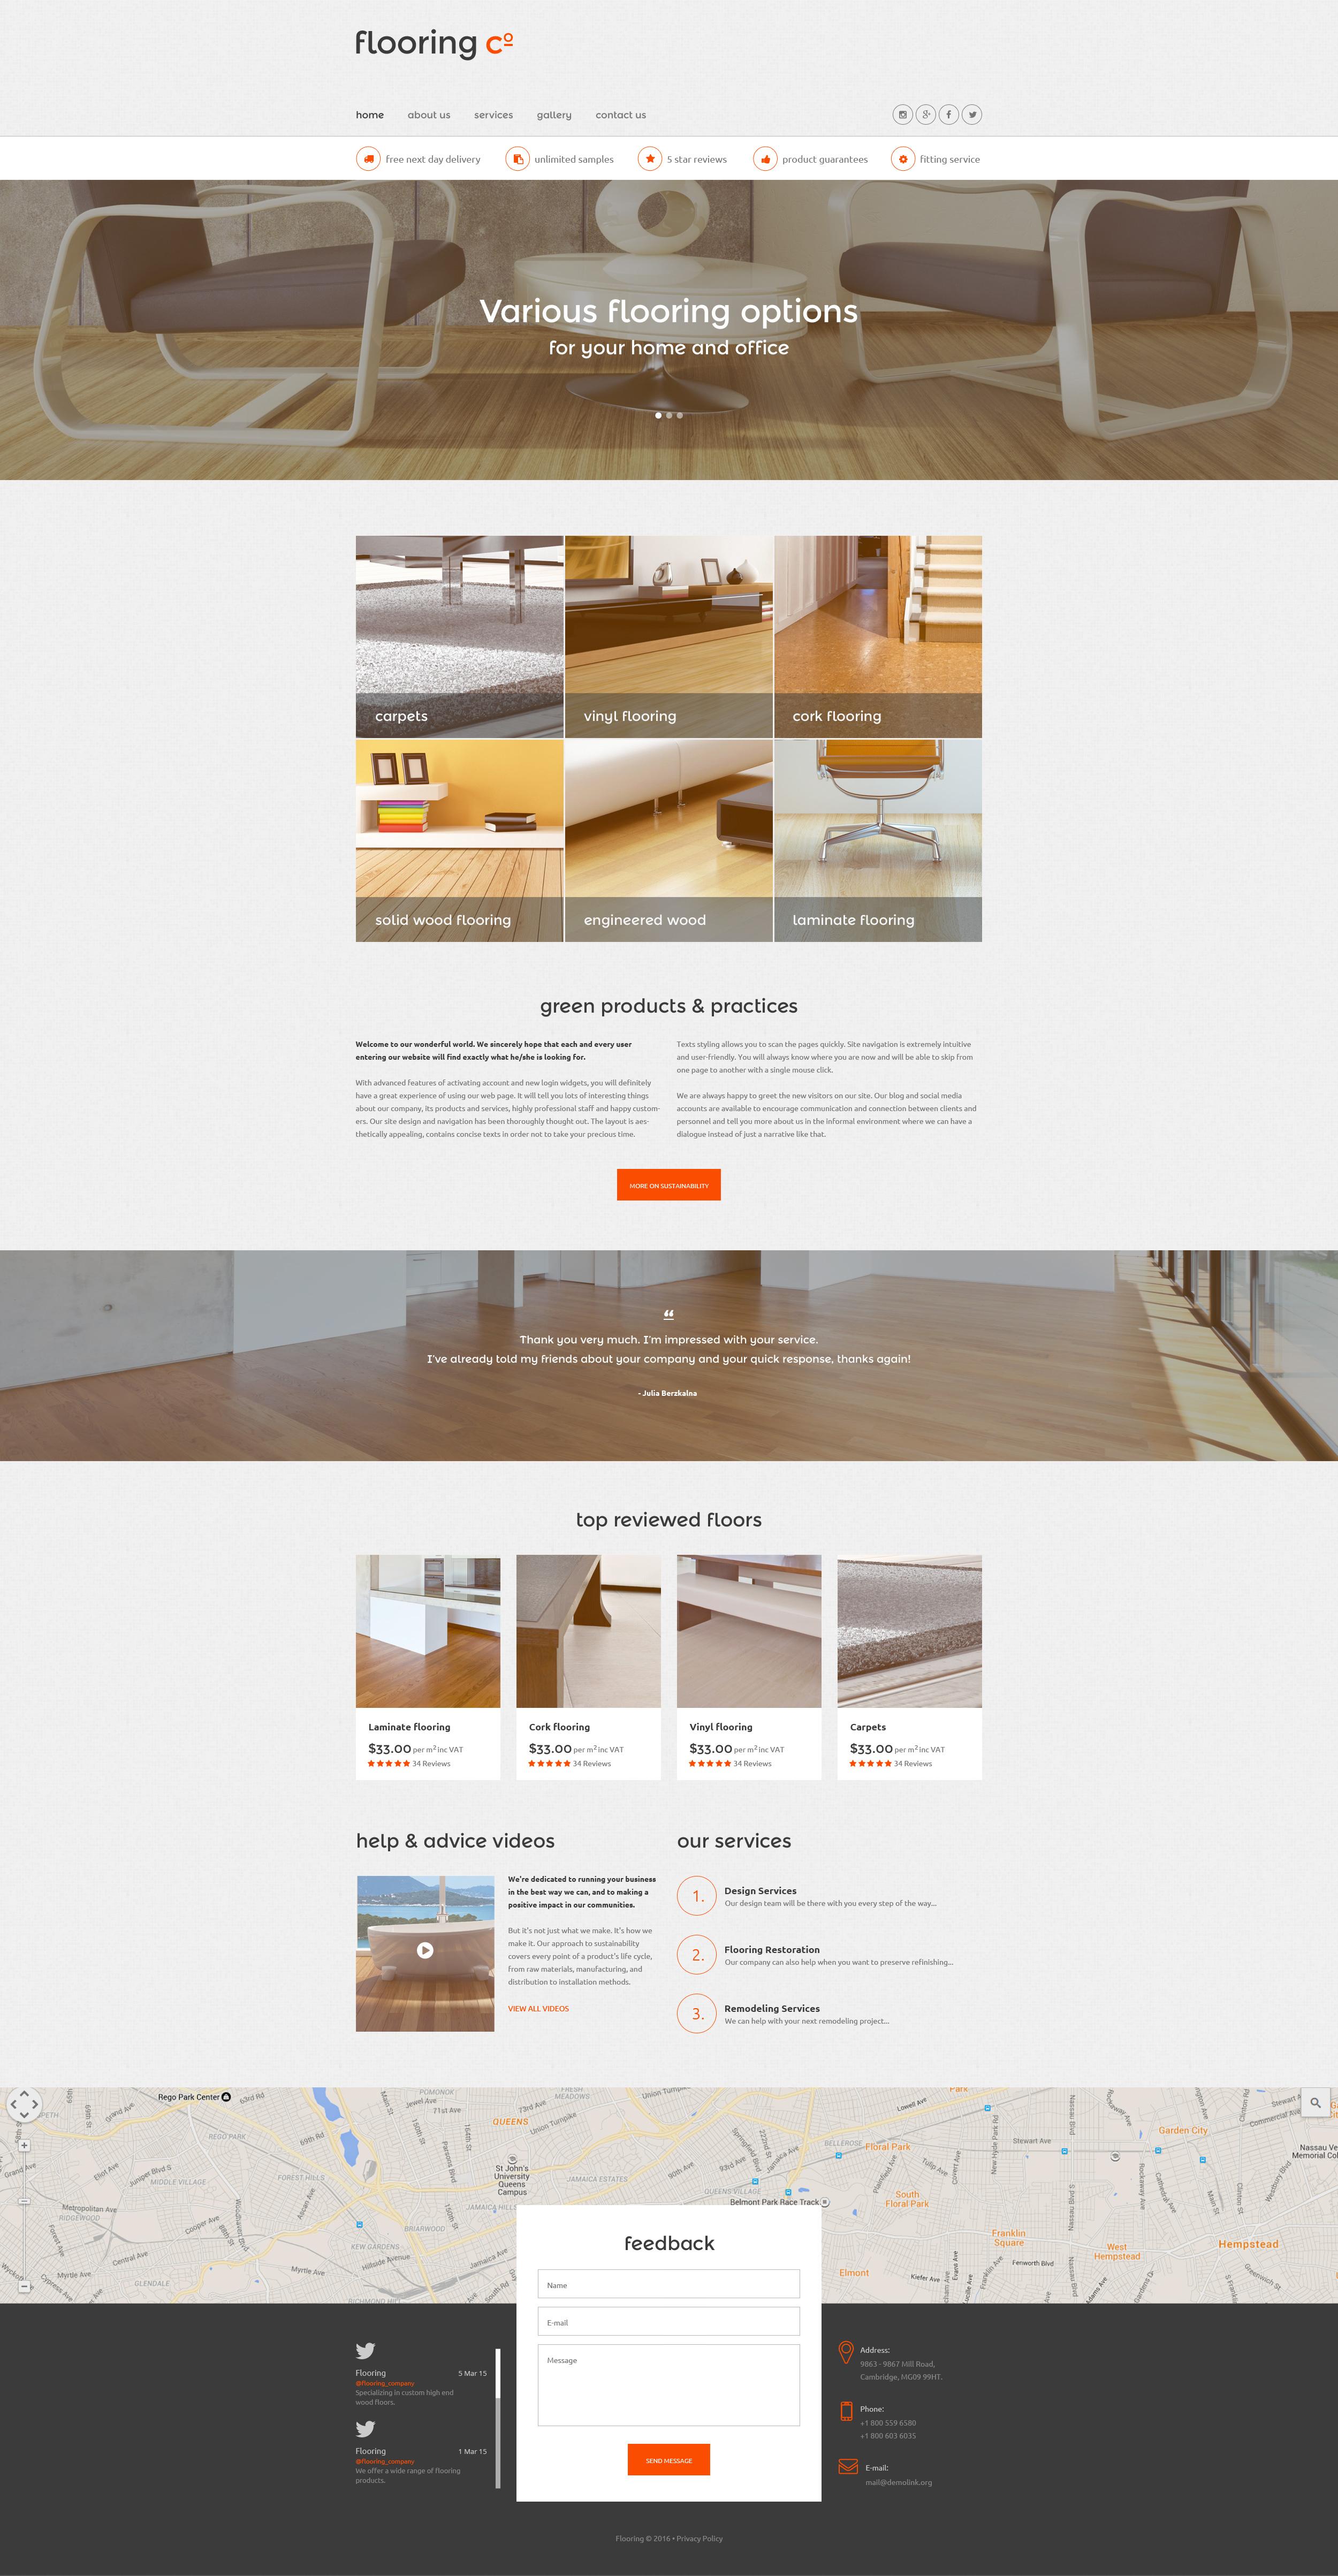 Flooring Co. Template Web №56096 - screenshot